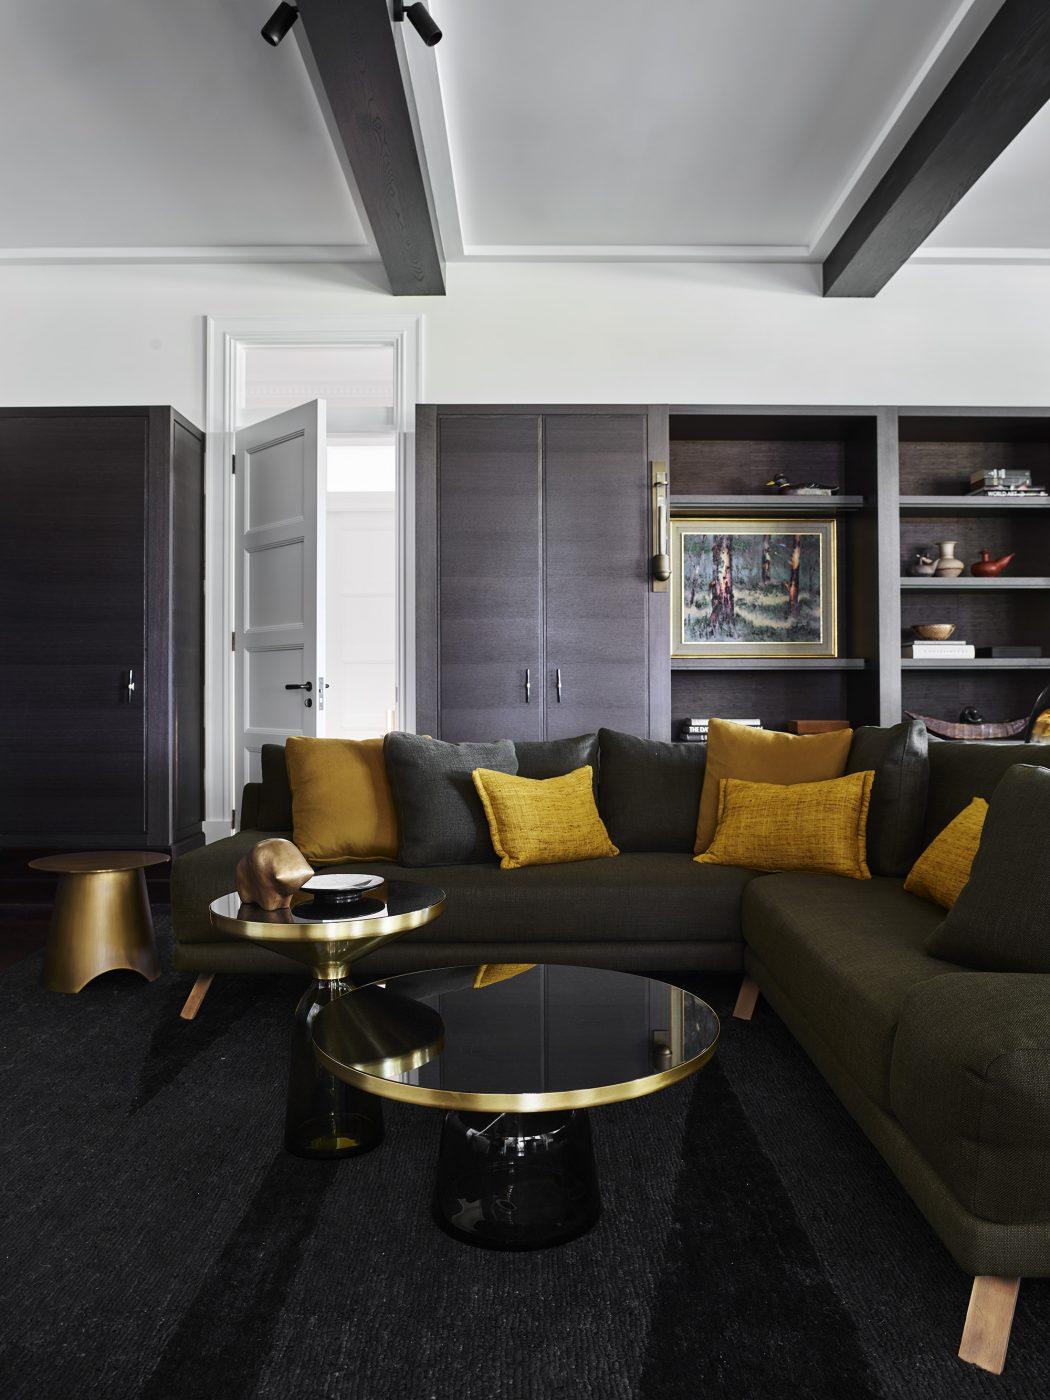 Living room designed by Alexandra Donohoe Church